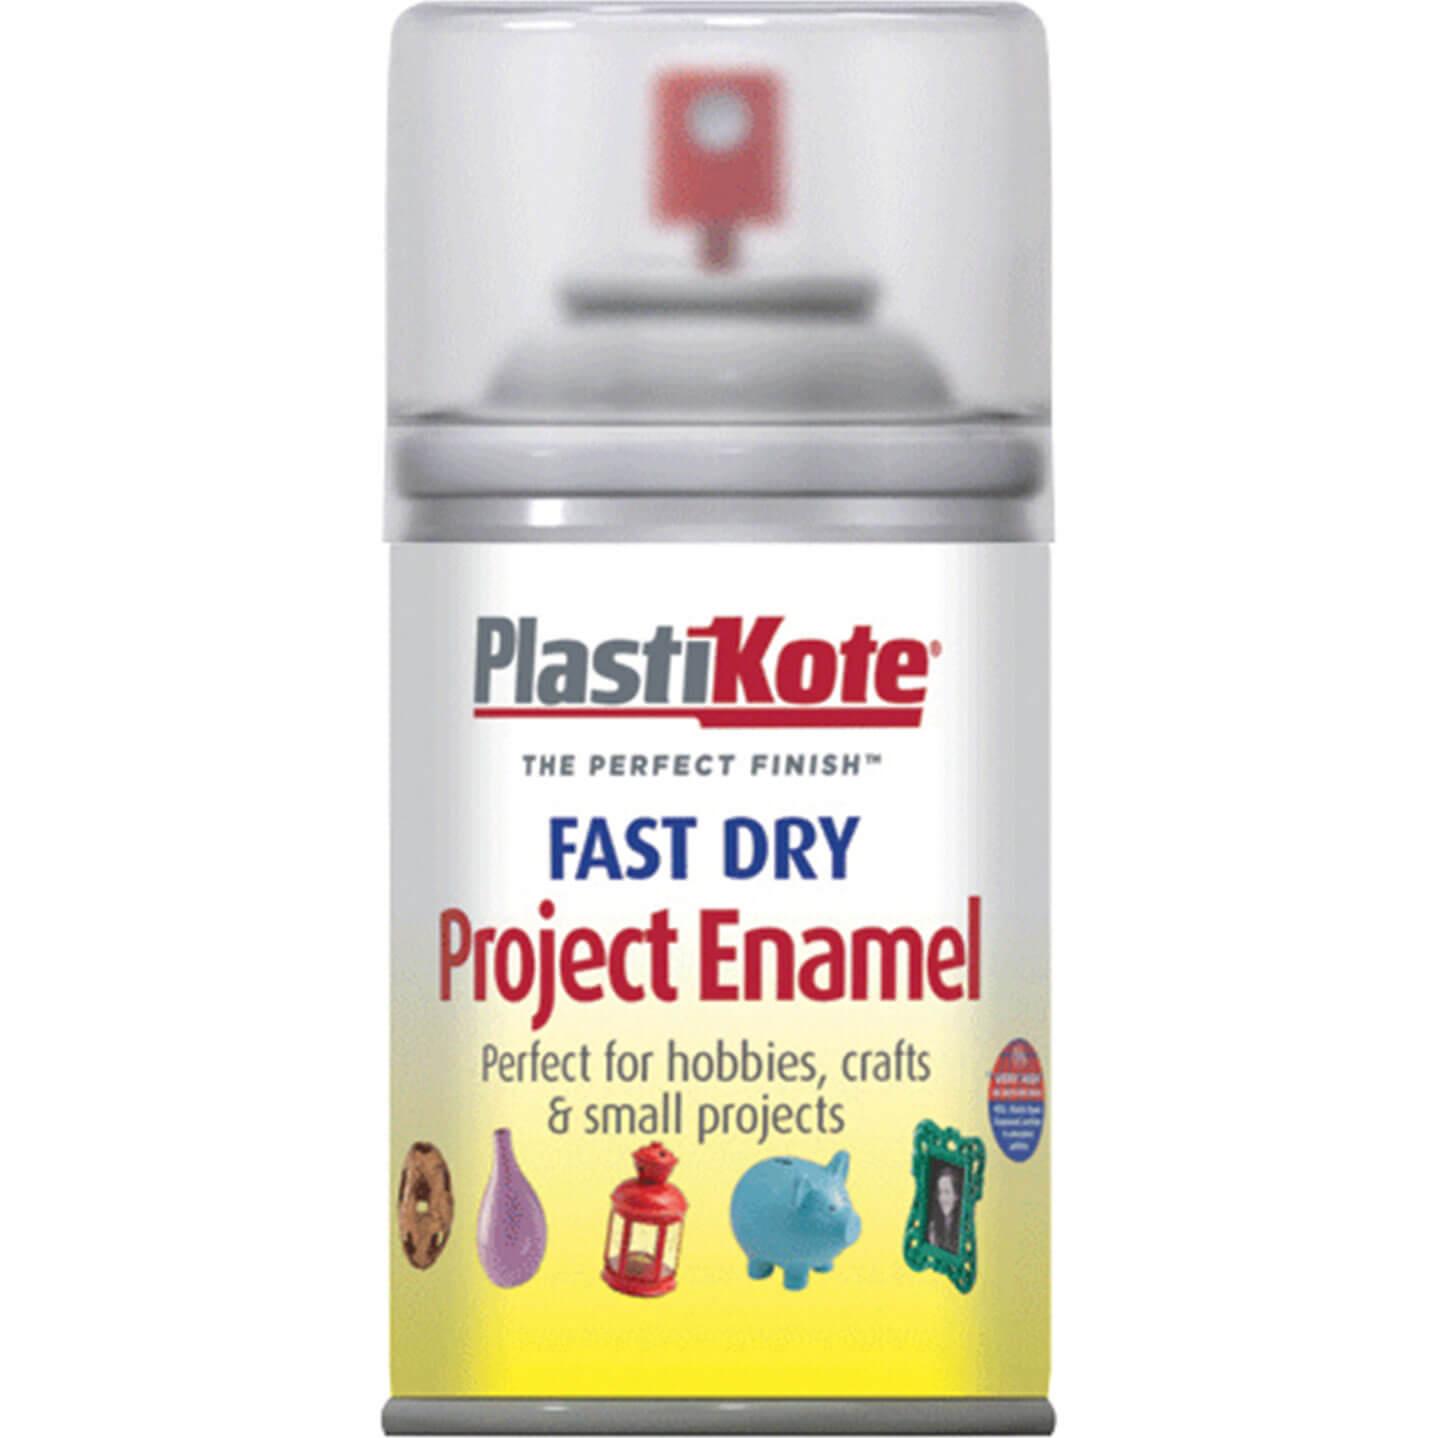 Image of Plastikote Dry Enamel Aerosol Spray Paint Clear 100ml